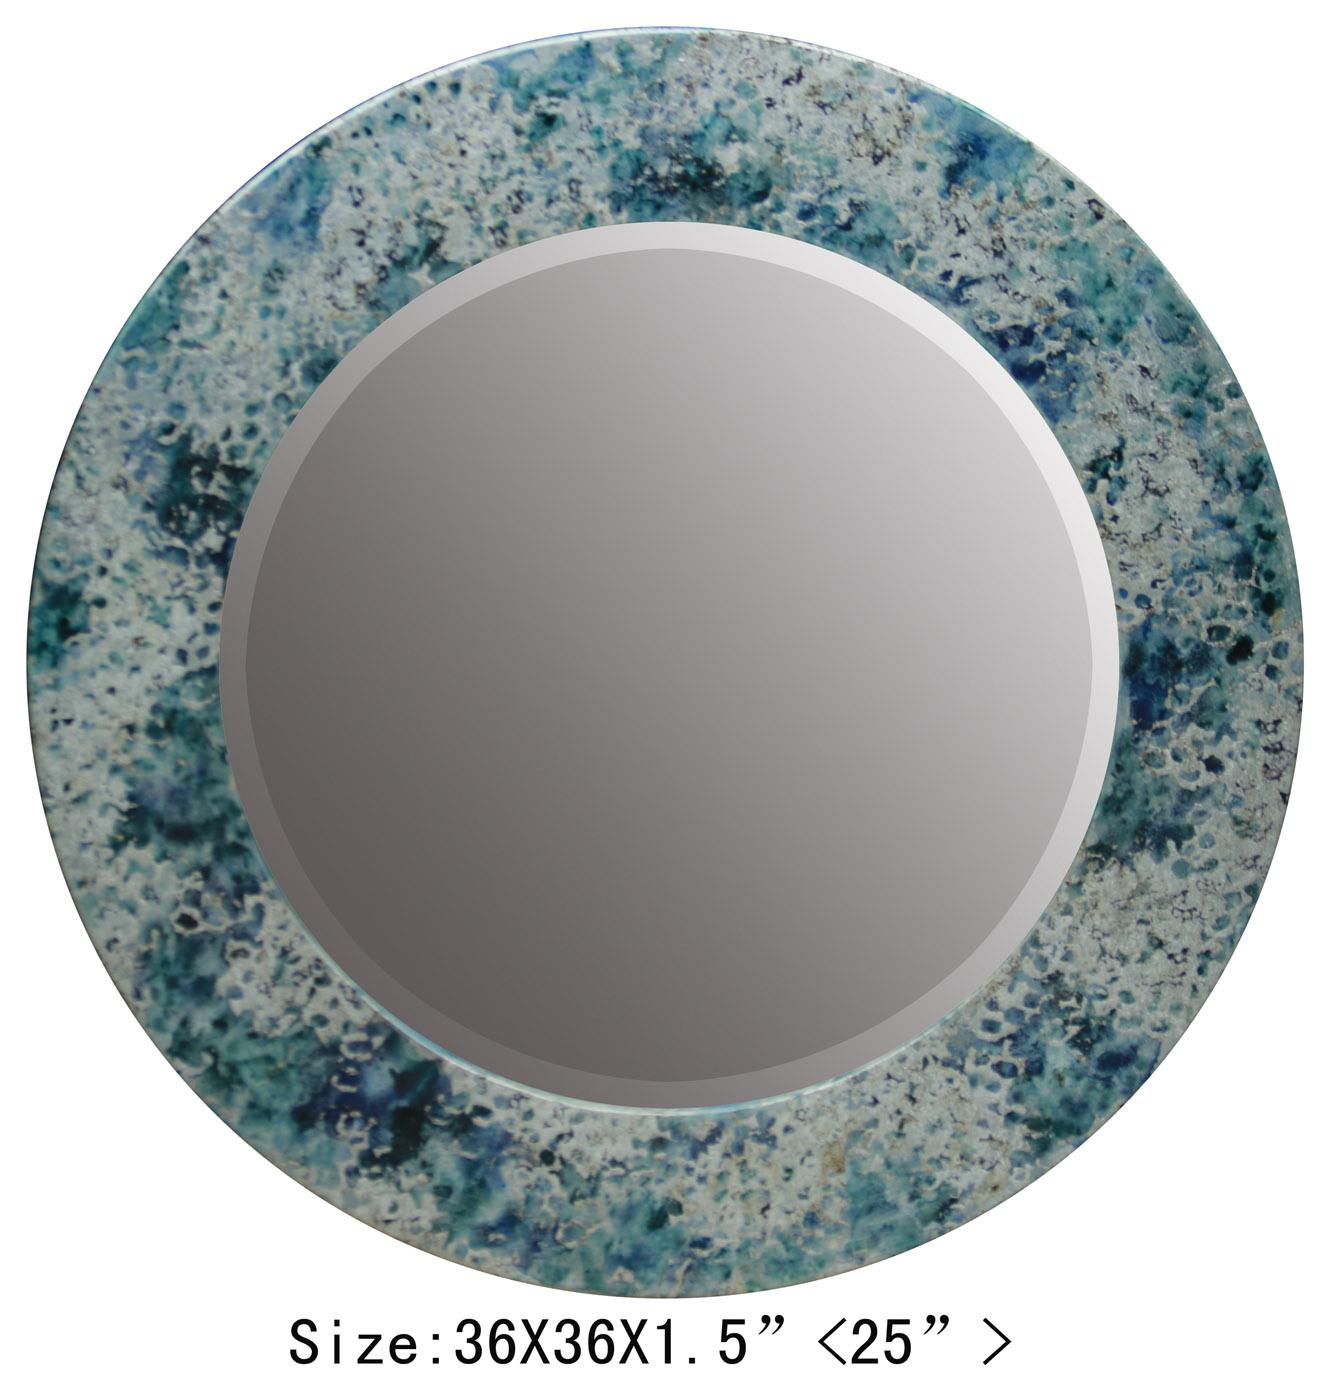 Wall Art for Holesale Home Interior Walls Decorative Foil Wall Mirror